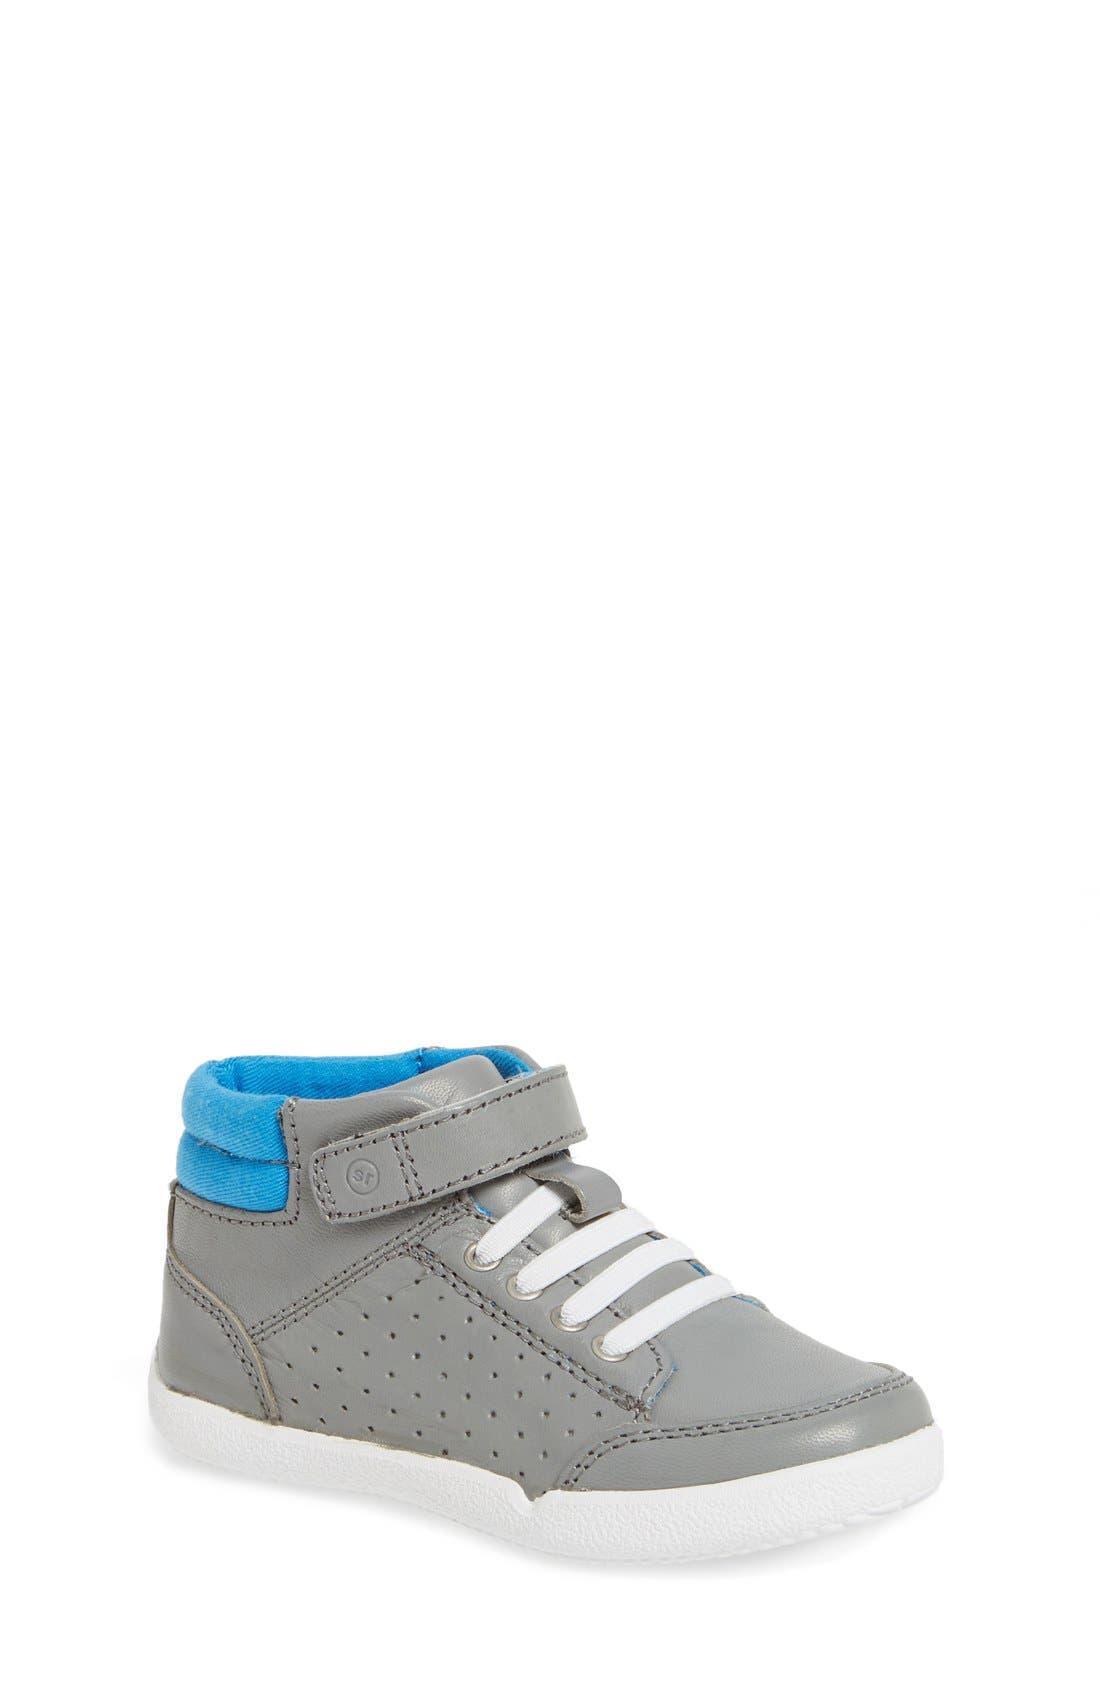 'Stone' Sneaker,                             Main thumbnail 1, color,                             Grey